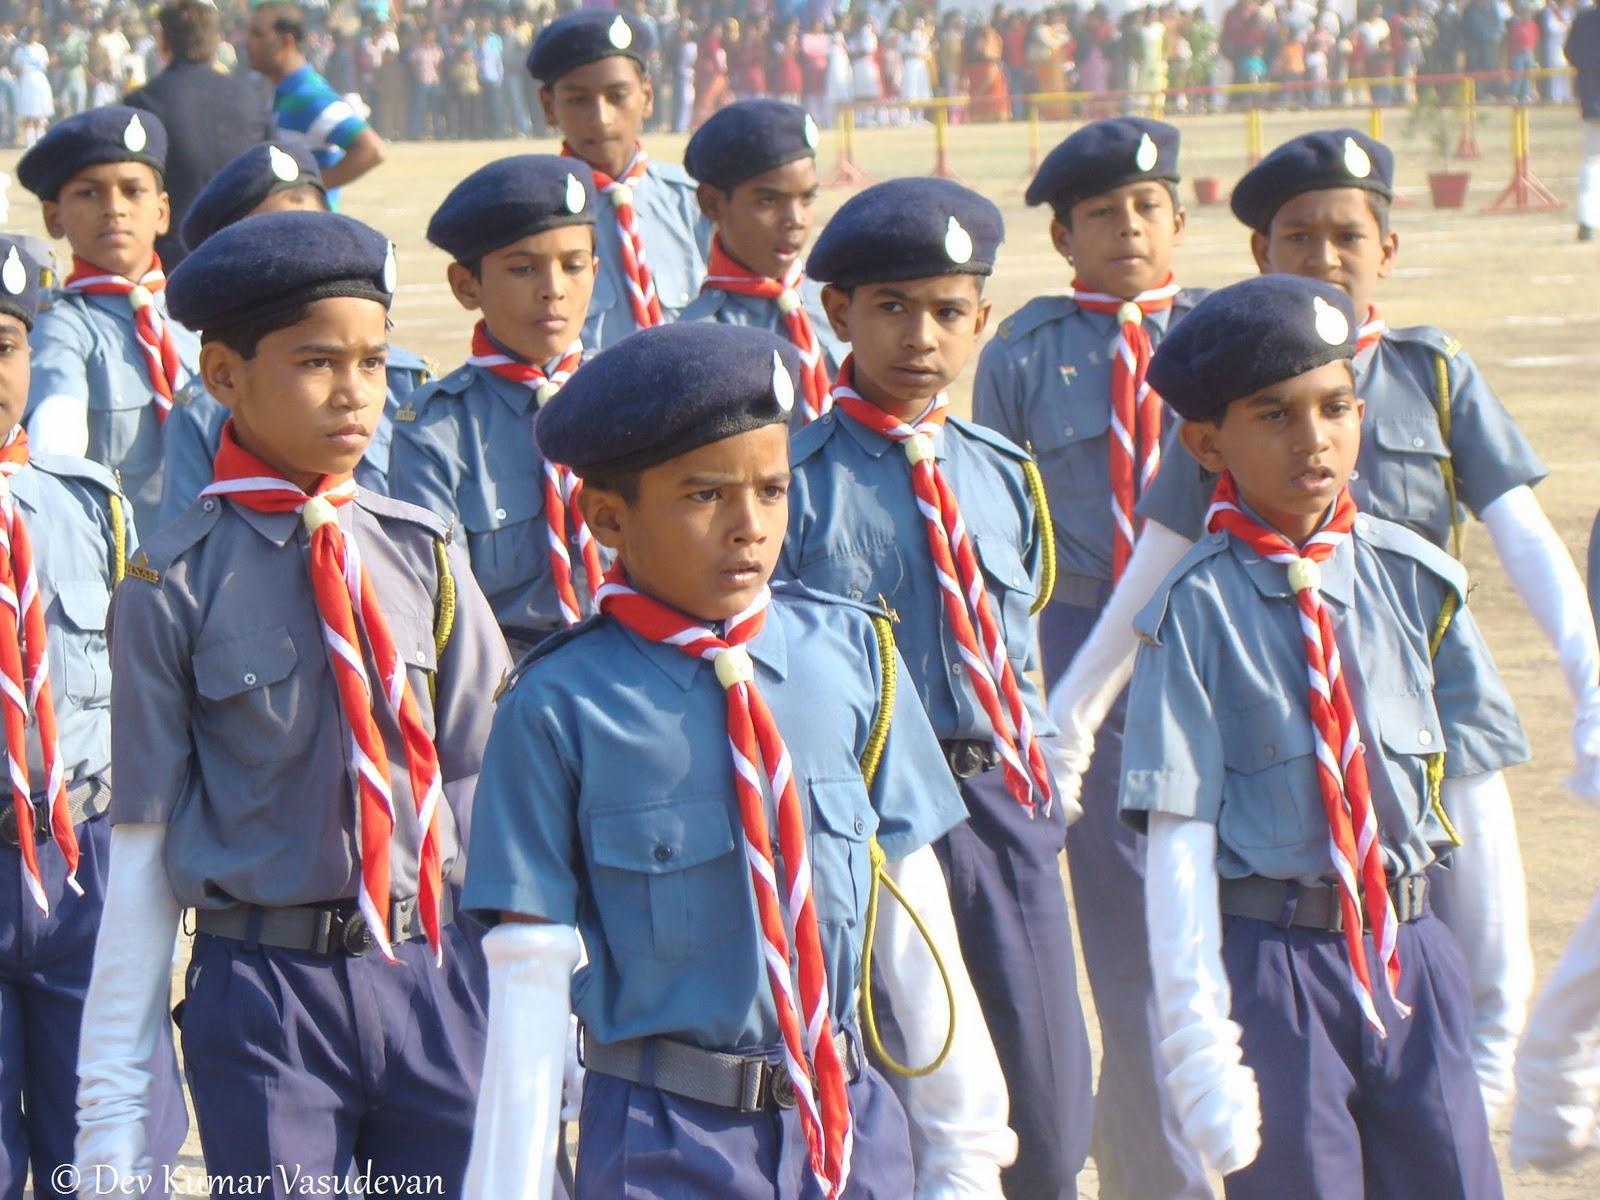 mhow ki khabrein blogposts mhow mp india february